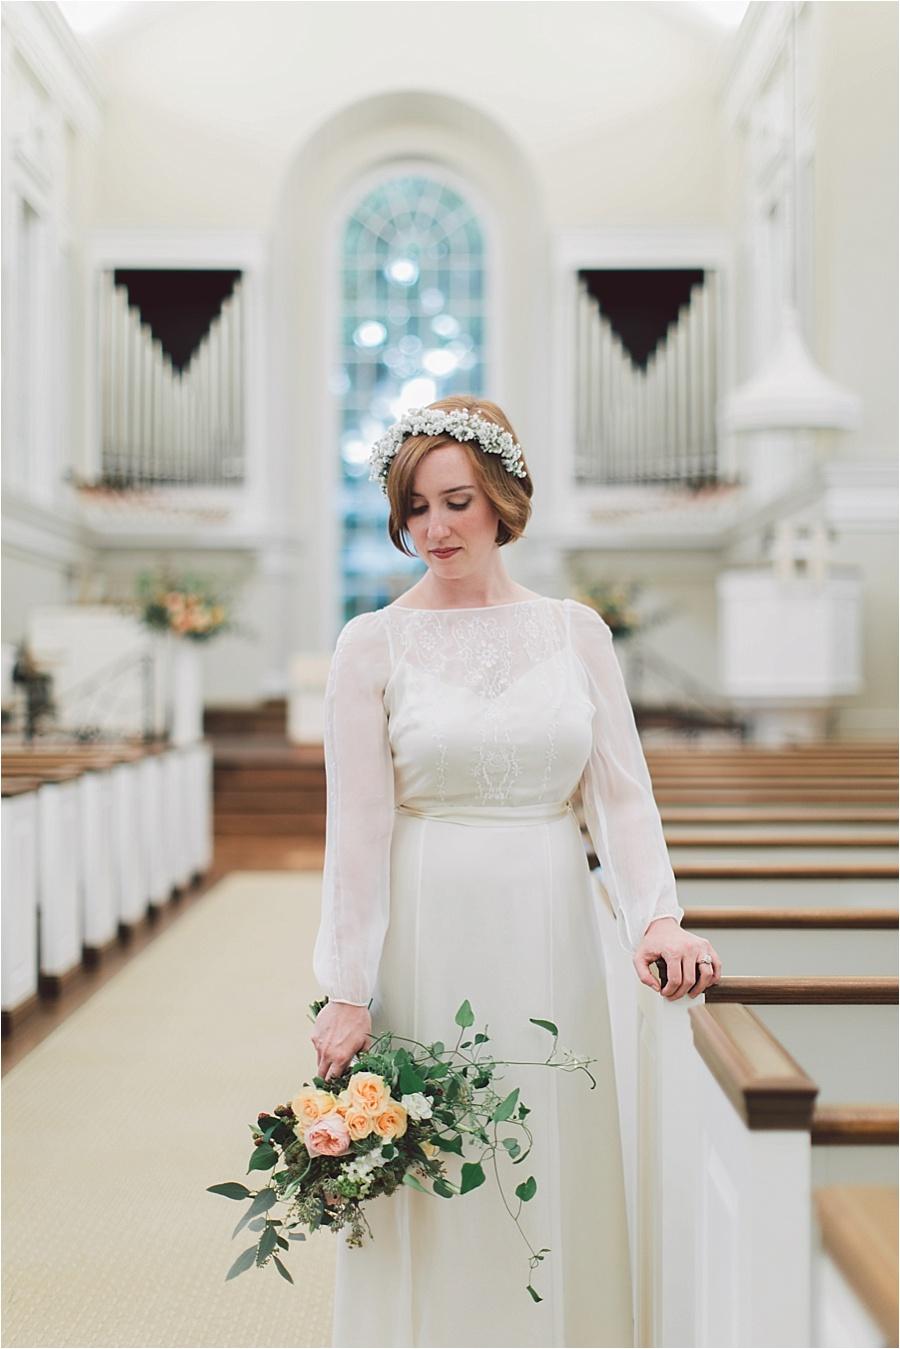 CK-Photo-Nashville-Wedding-Photographer-b_0066.jpg